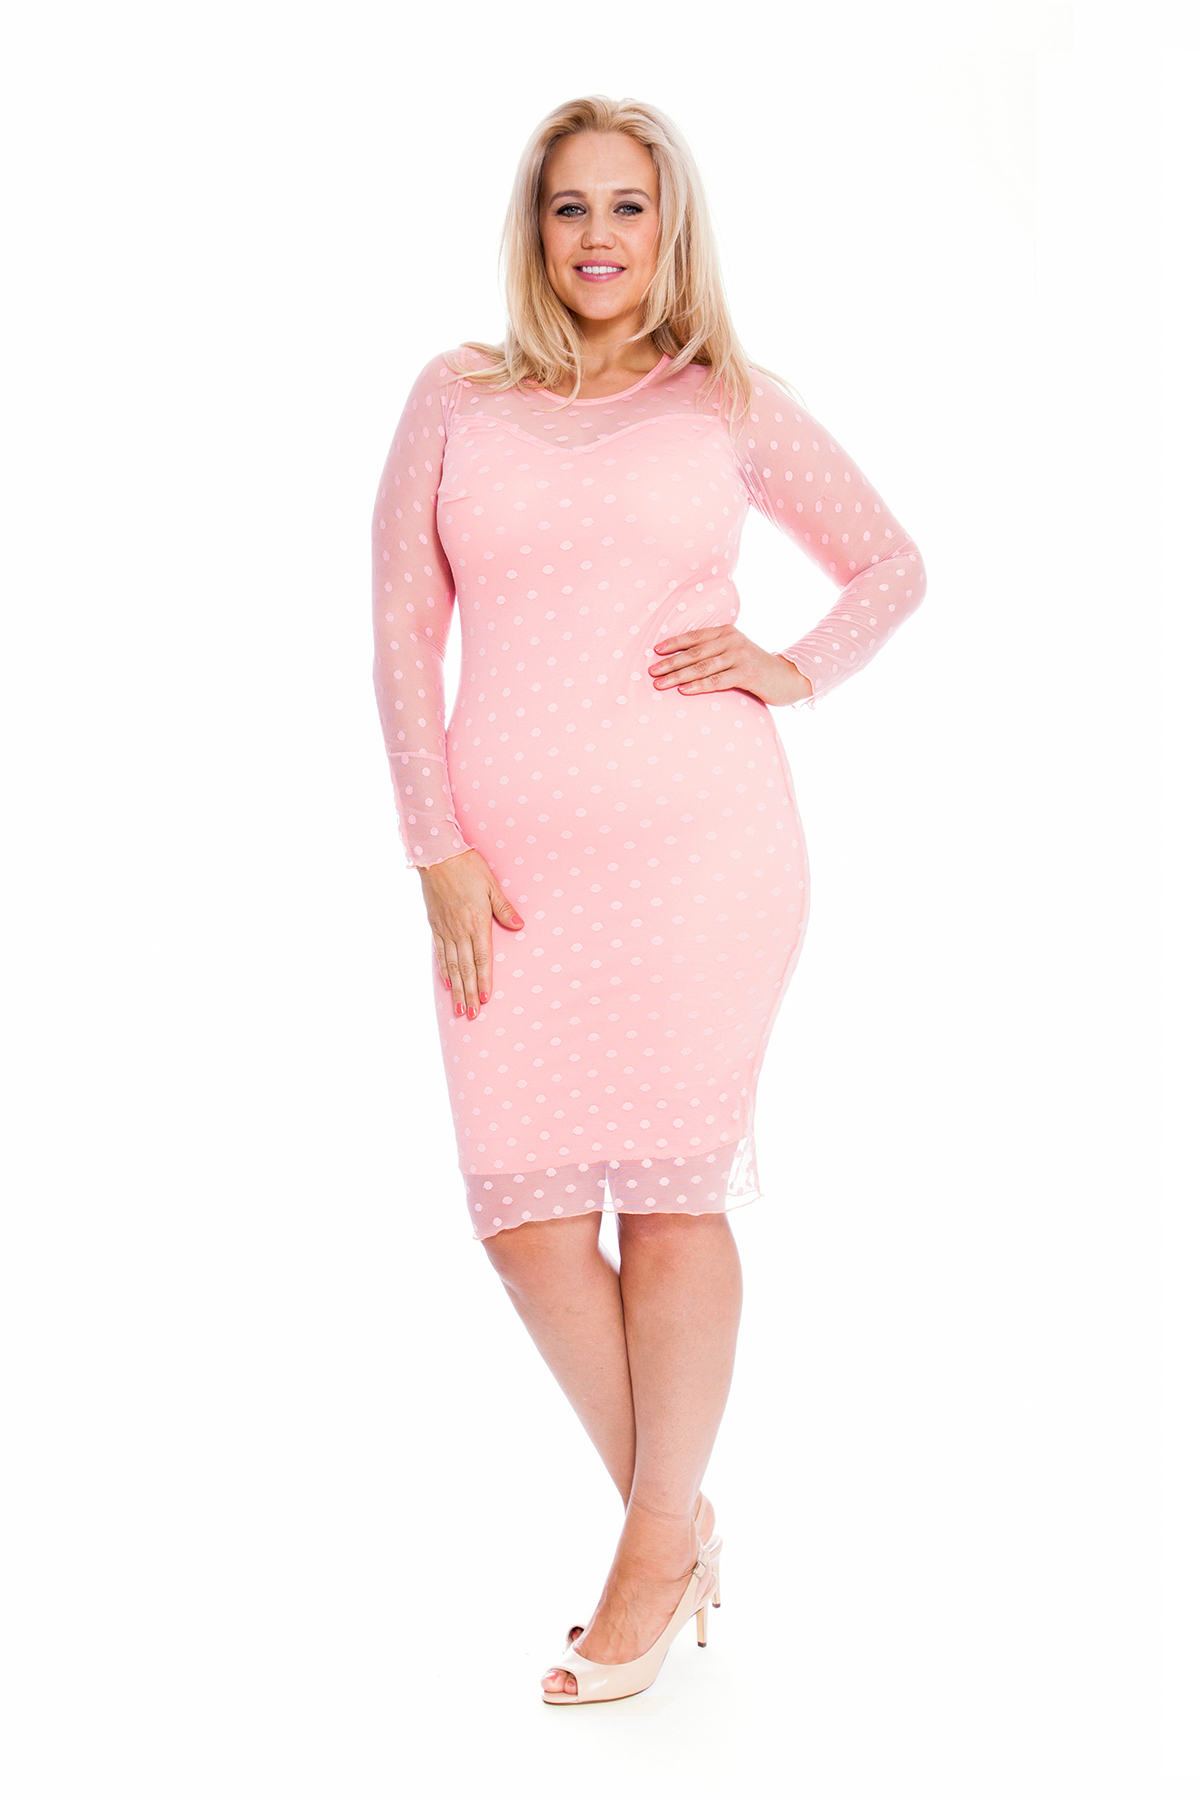 New Ladies Plus Size Dress Women Lace Polka Dot Midi Party ... - photo #45